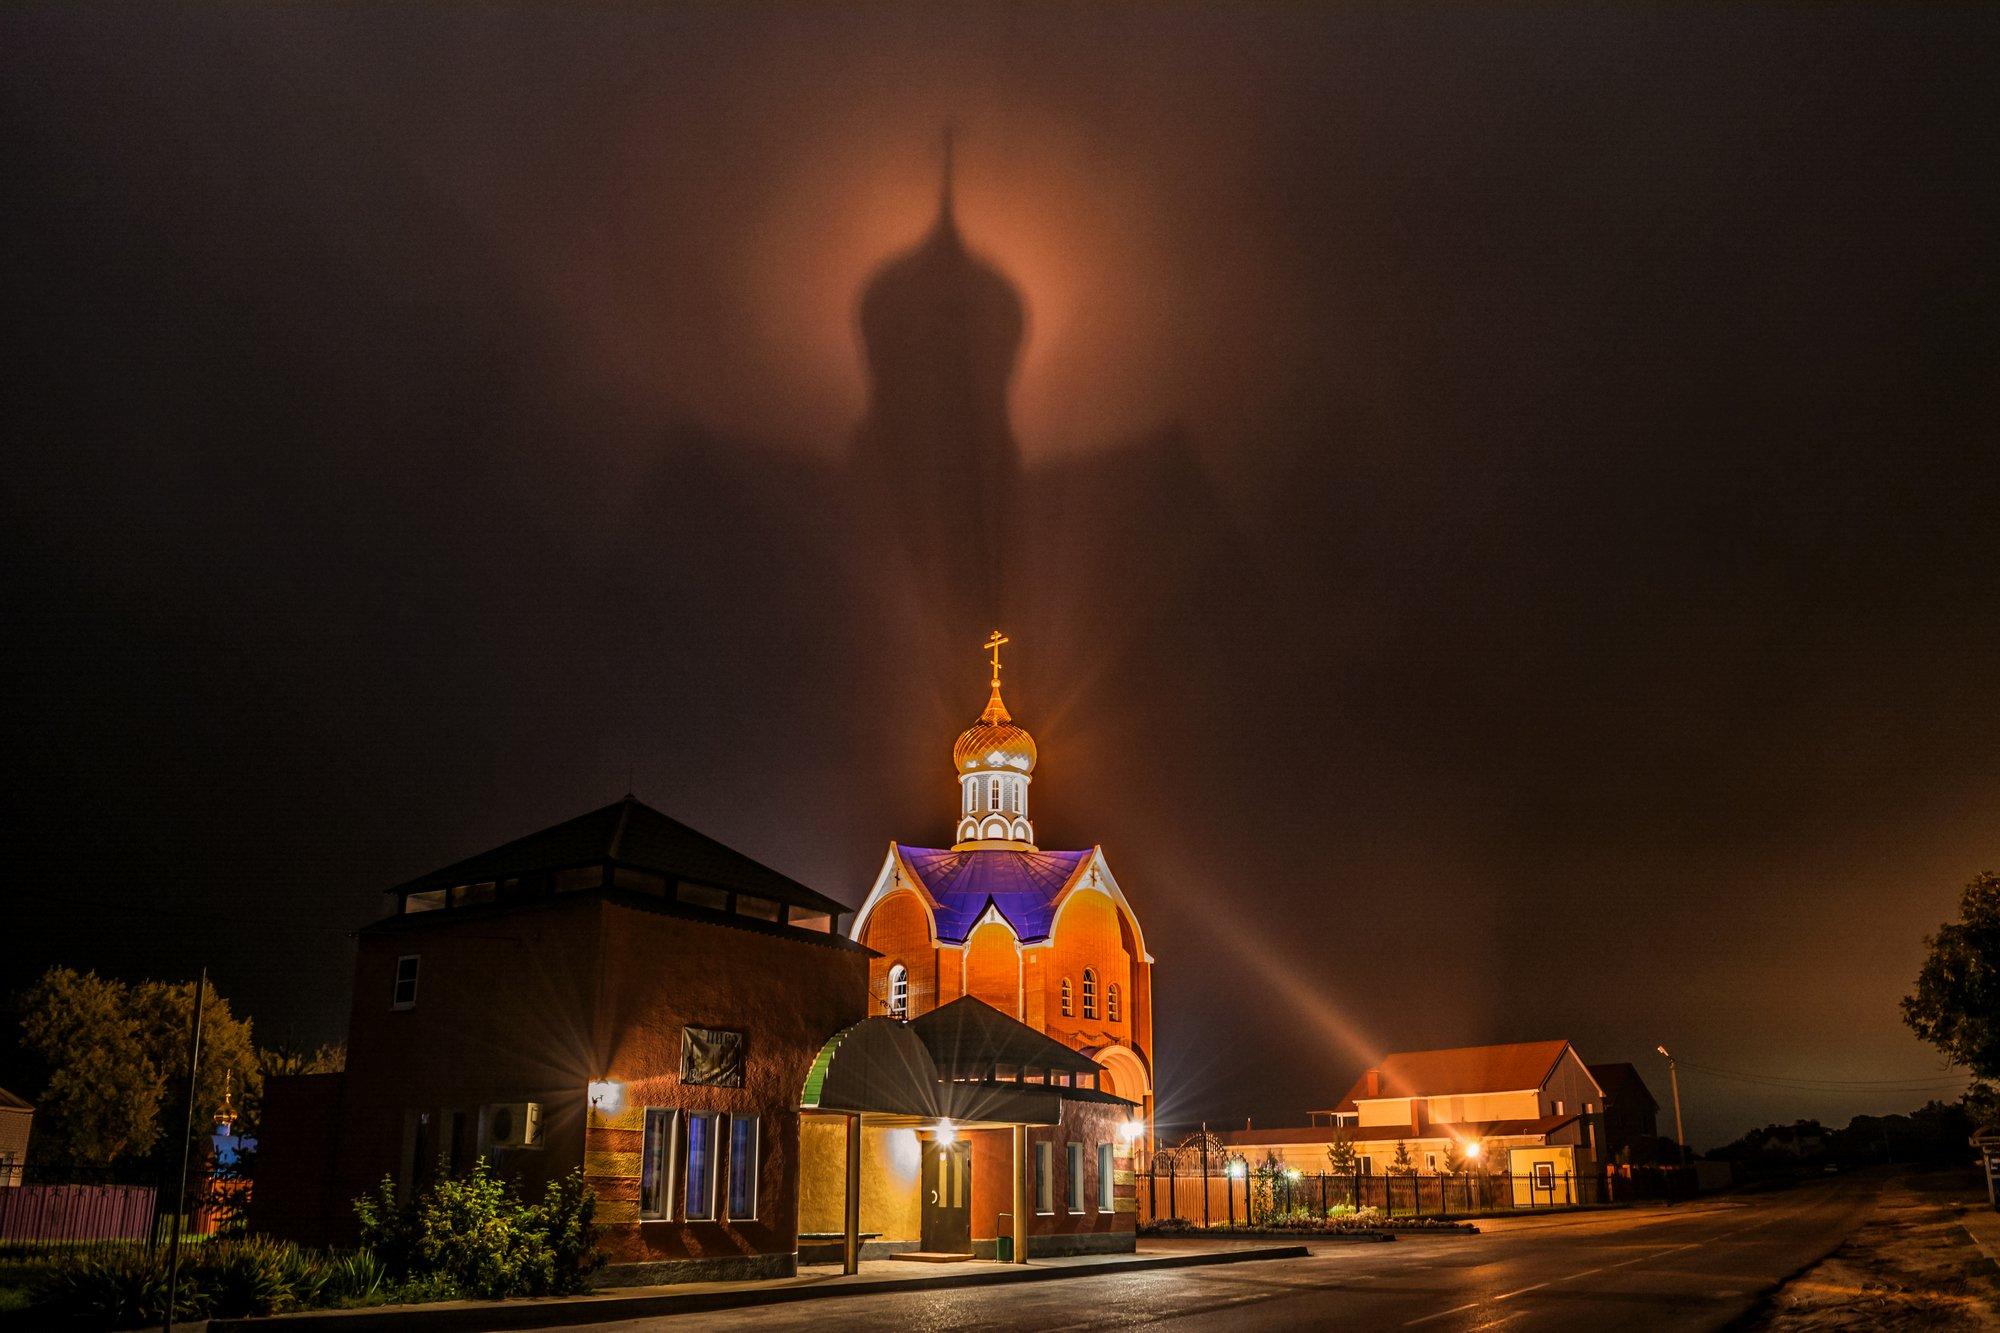 храм на небесах,храм,тень,шебекино, Литвишко Александр